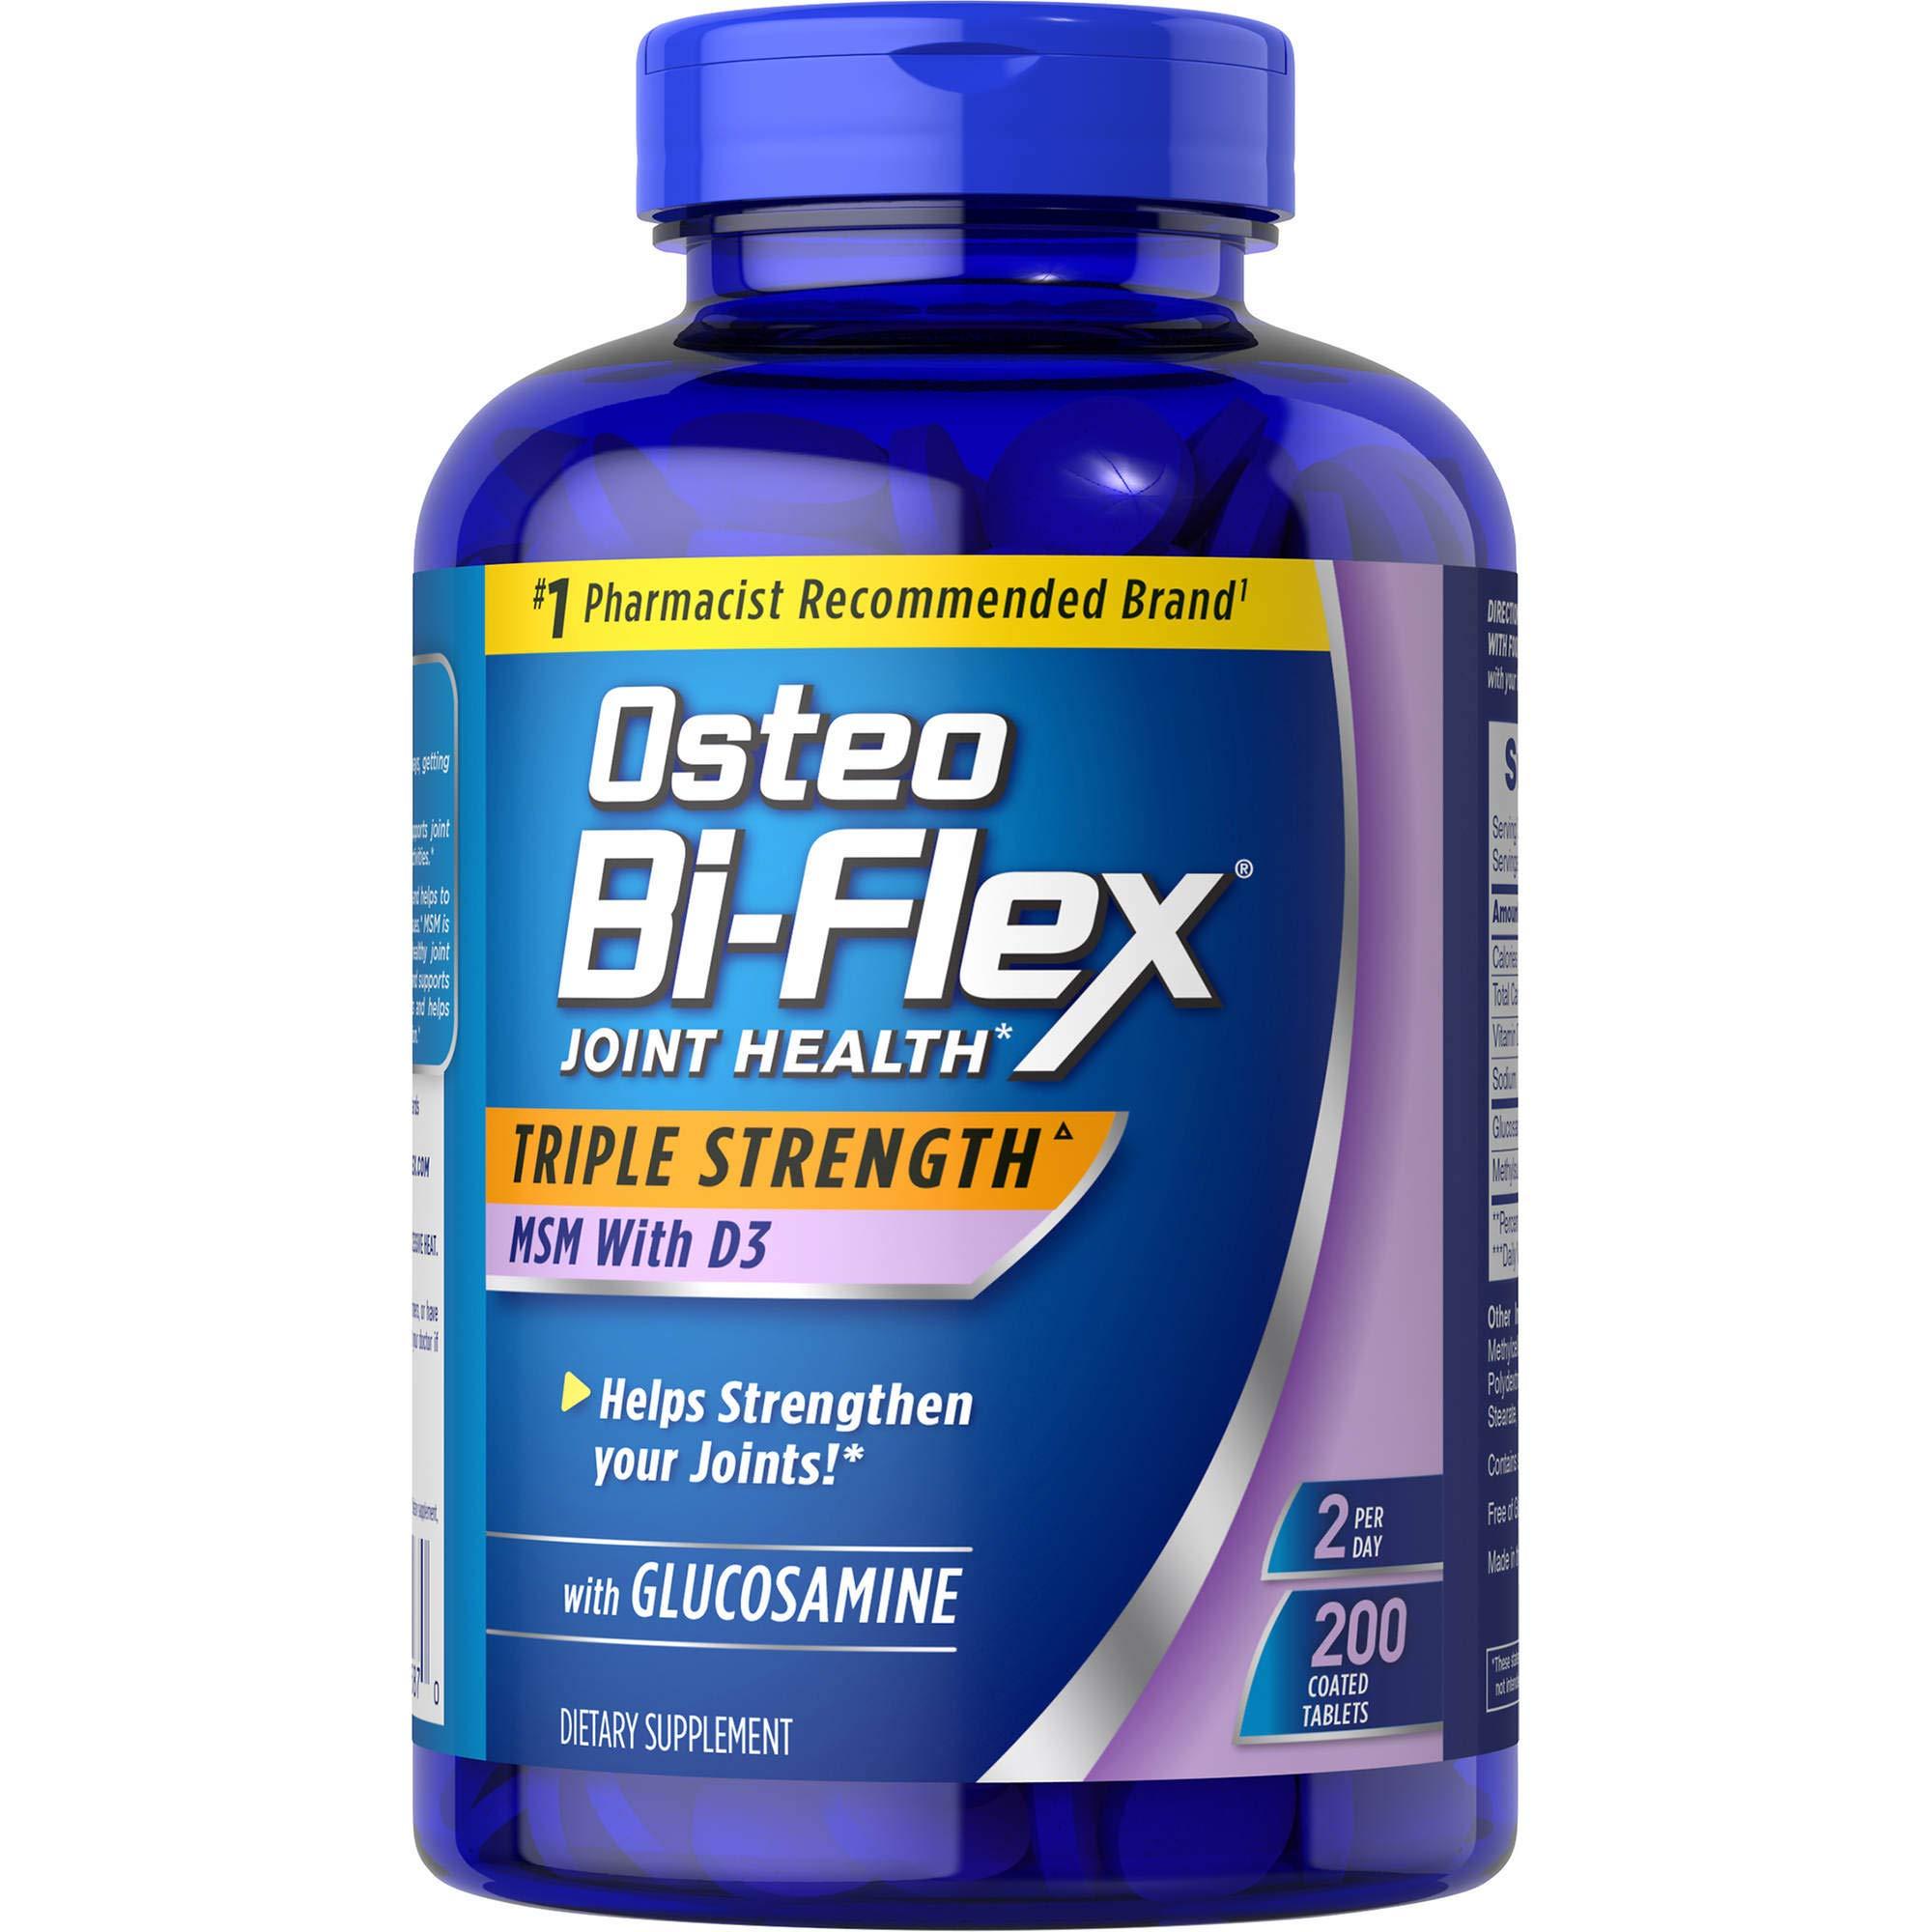 Osteo Bi-Flex 1,500mg (200 Count) Glucosamine HCl Tablets, 1 Pack, 200 Count by Osteo Bi-Flex